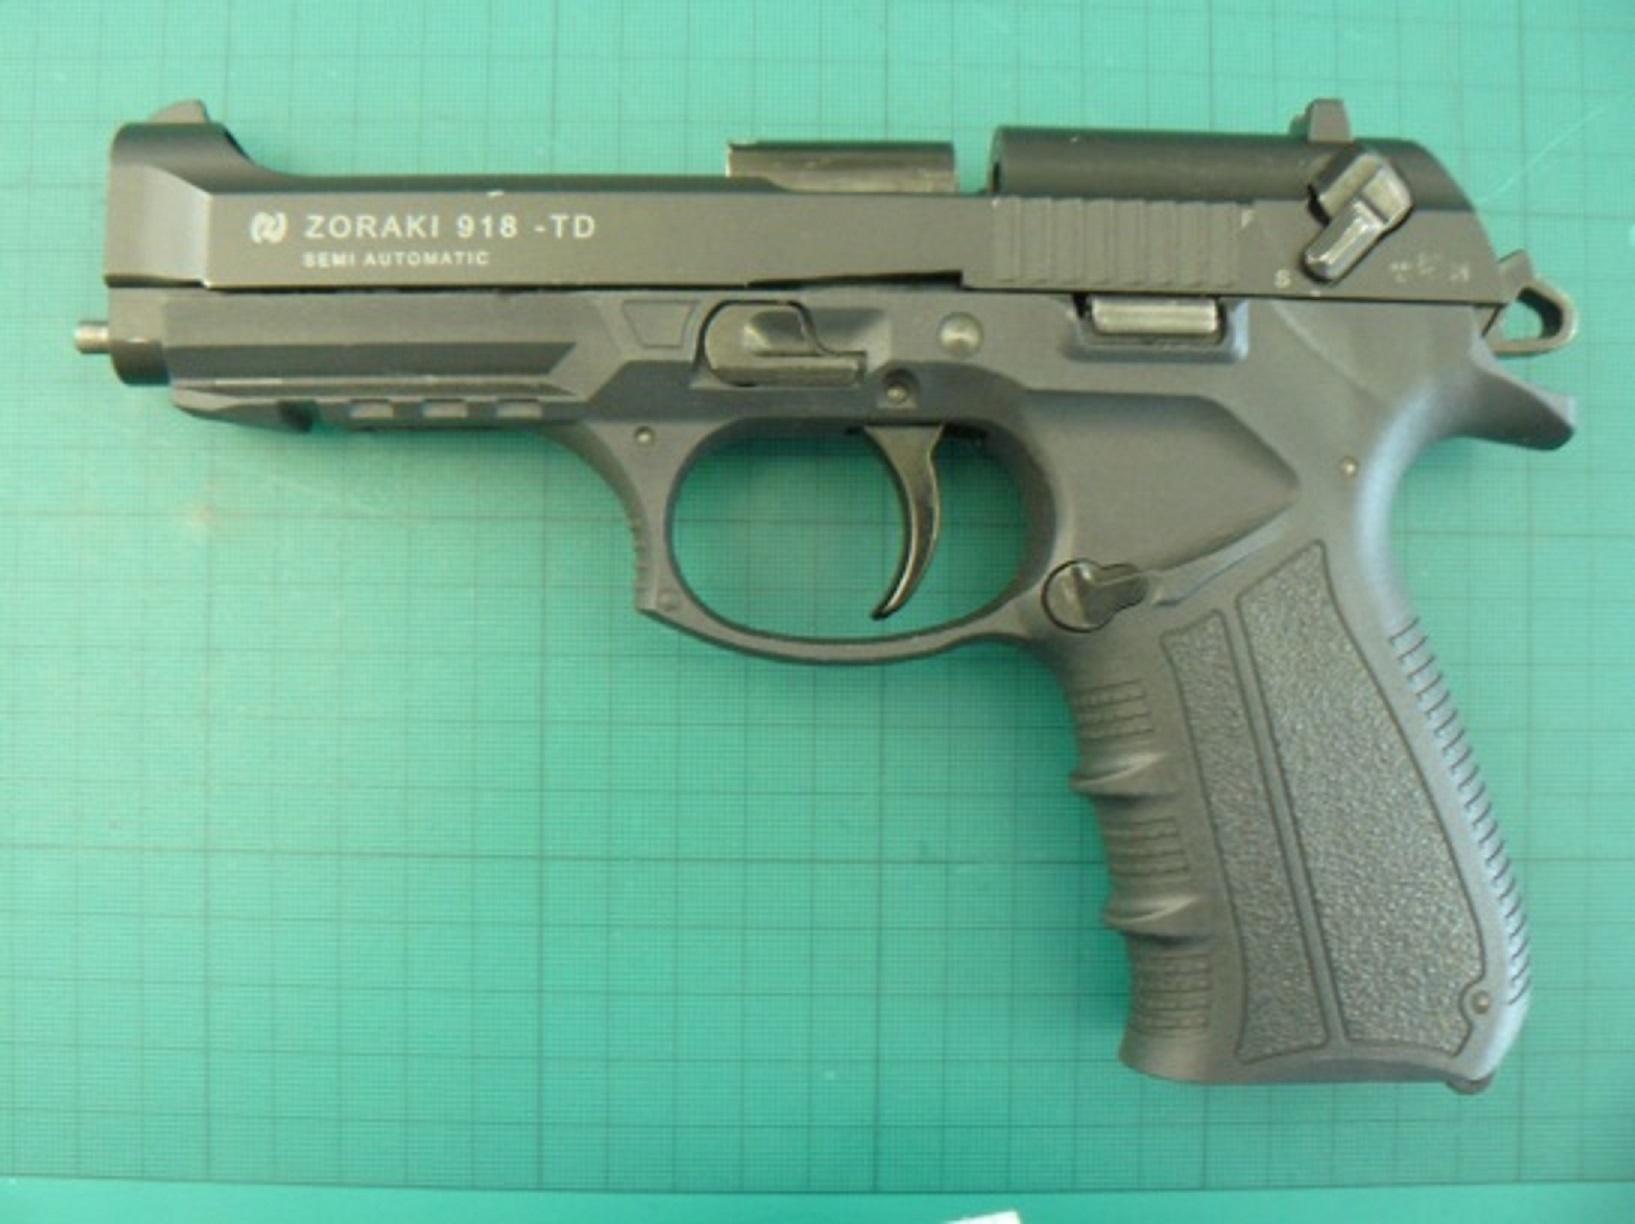 The handgun that was destined for John Stewart's address.